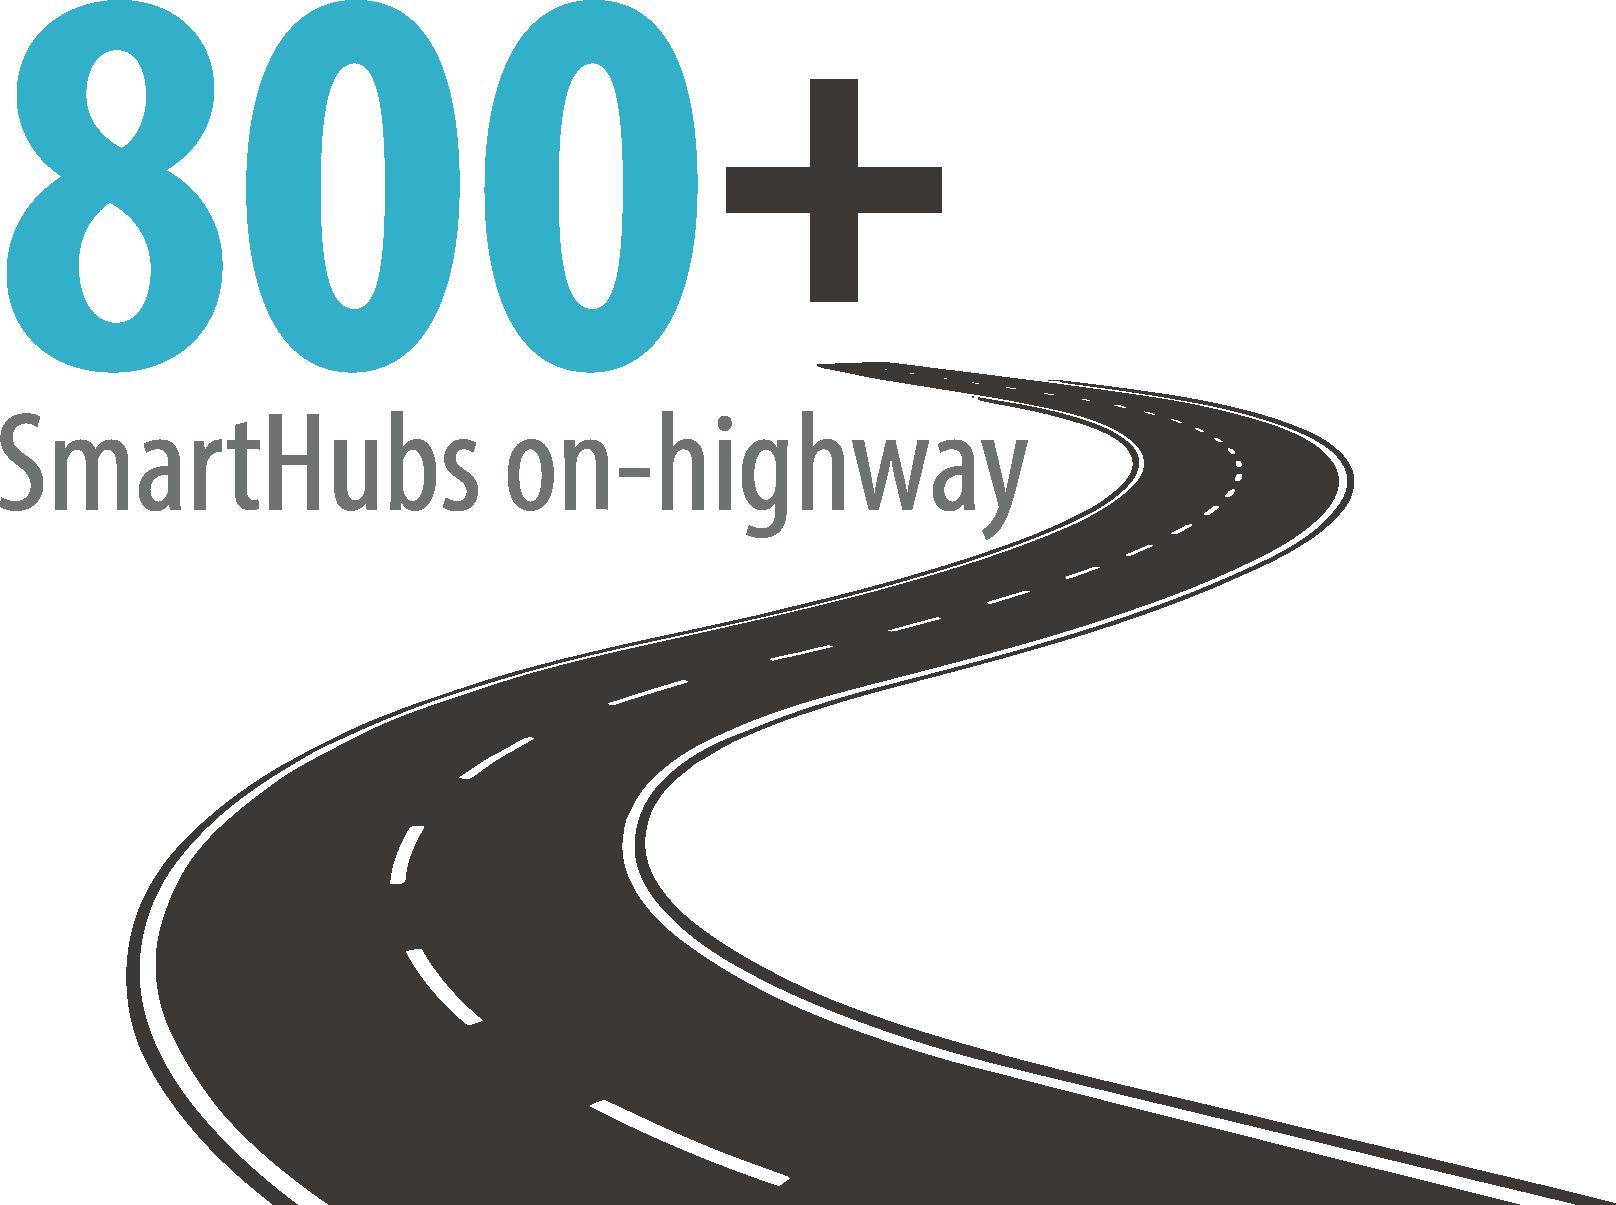 800 SmartHubs